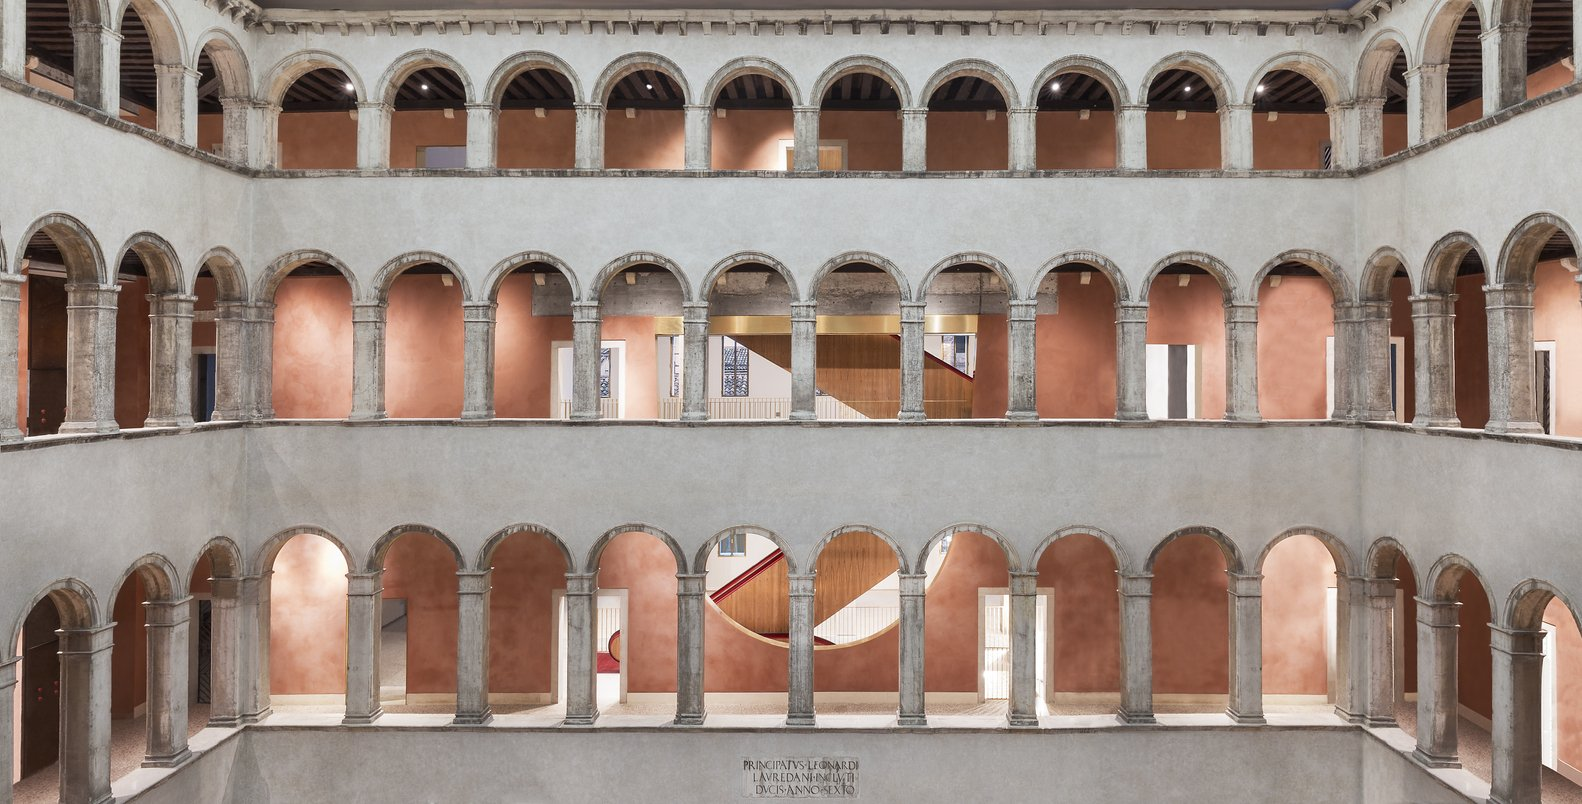 Fondaco dei Tedeschi - Architectural Stairs